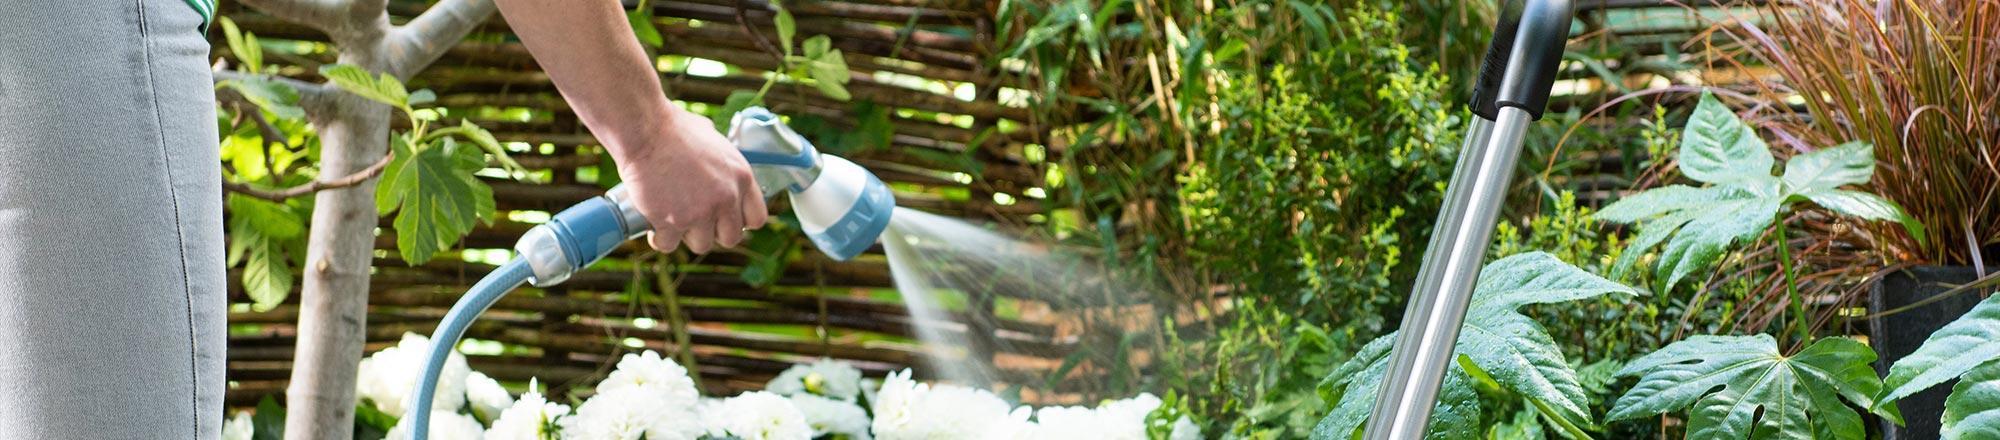 Water geven in je tuin